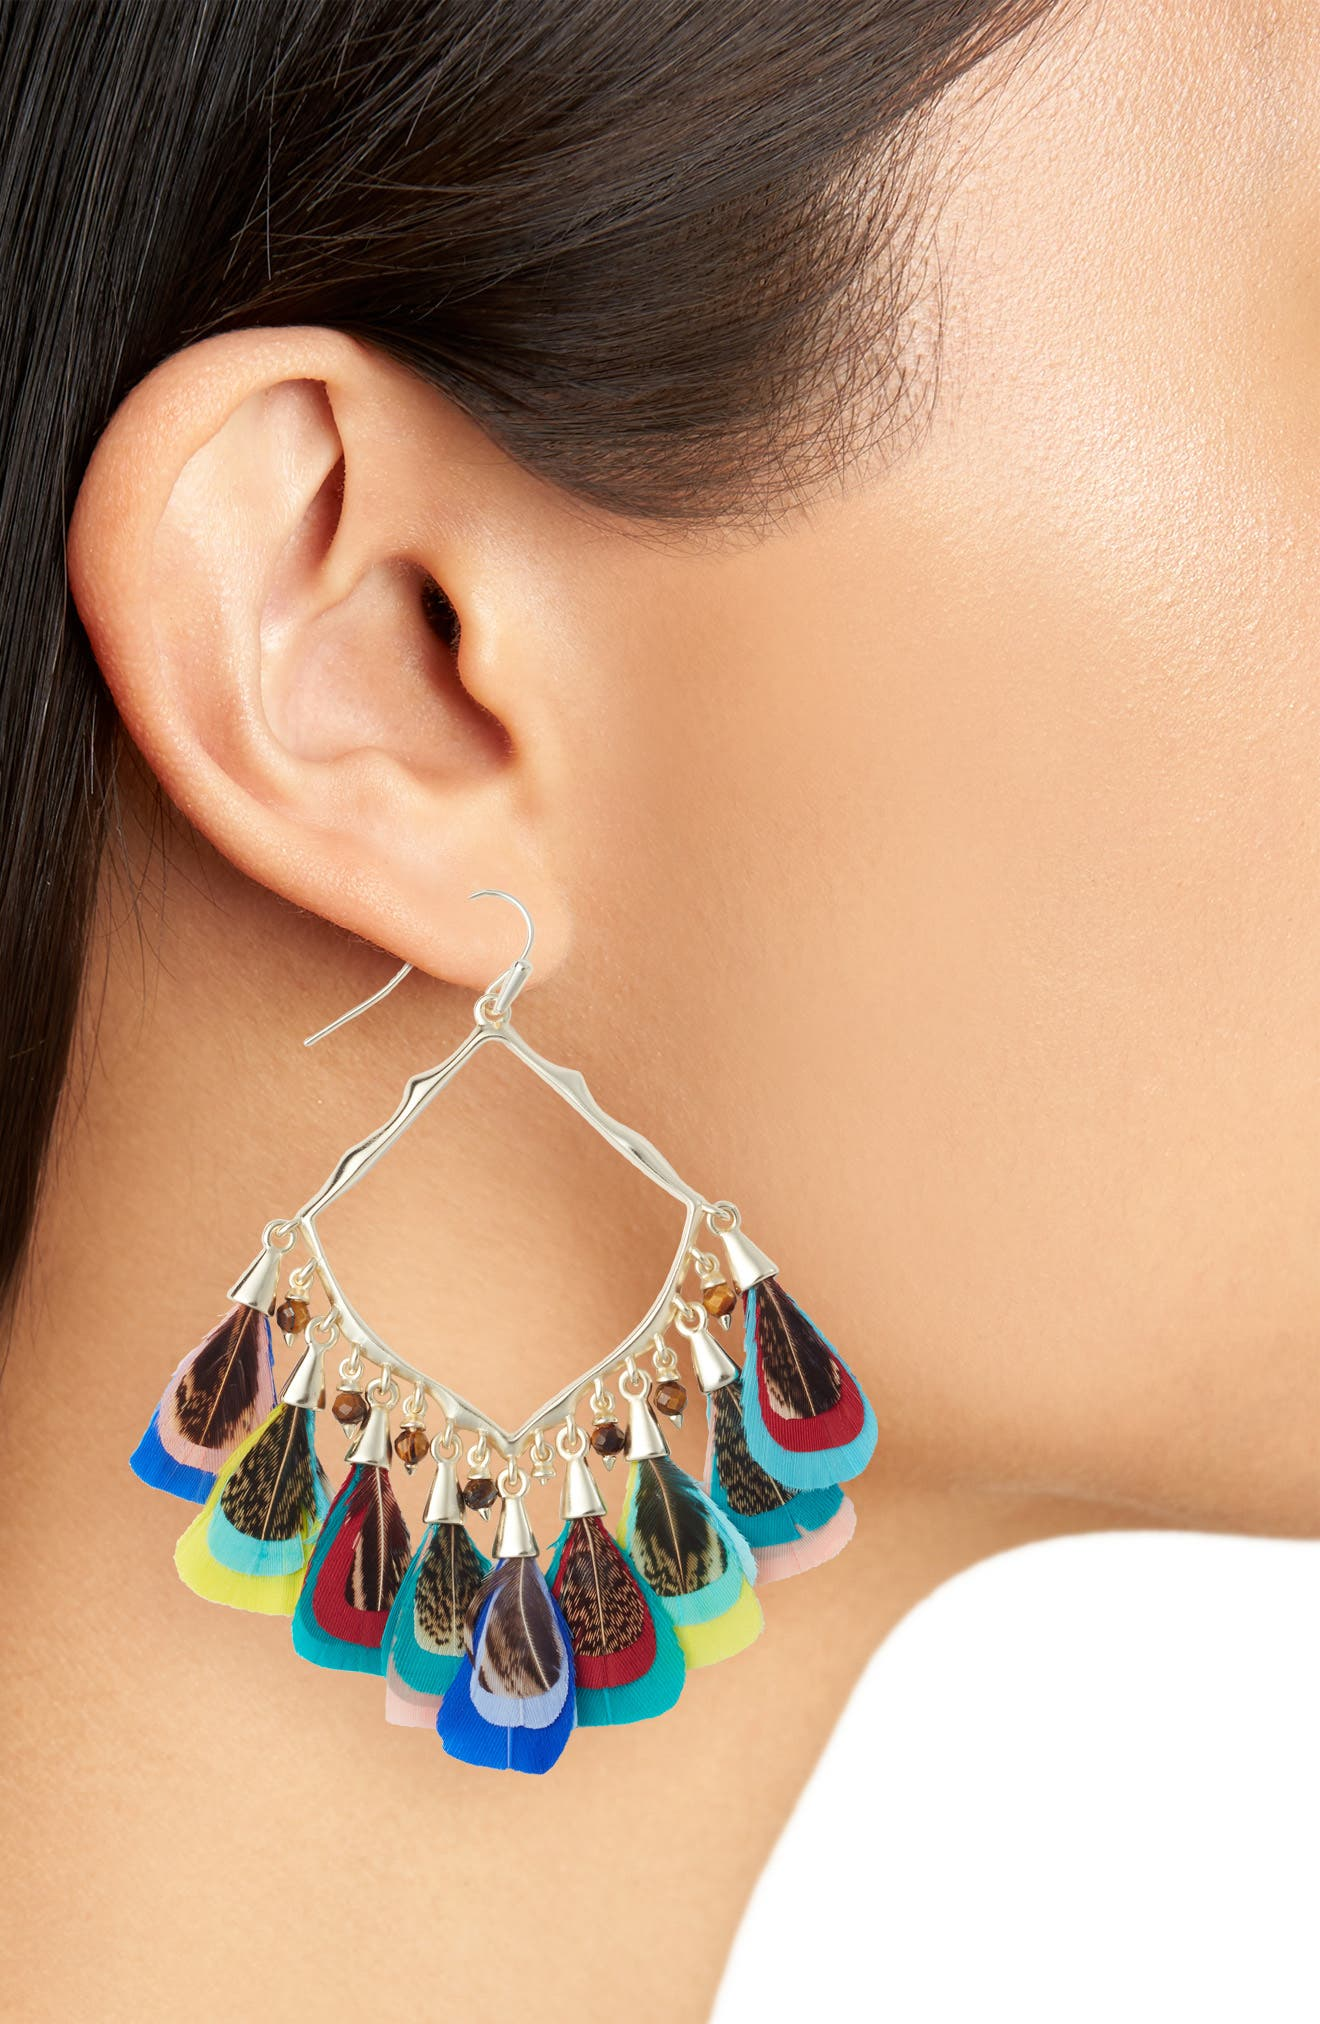 Raven Earrings,                             Alternate thumbnail 2, color,                             MULTI FTHR/ BEAD MIX/ GOLD